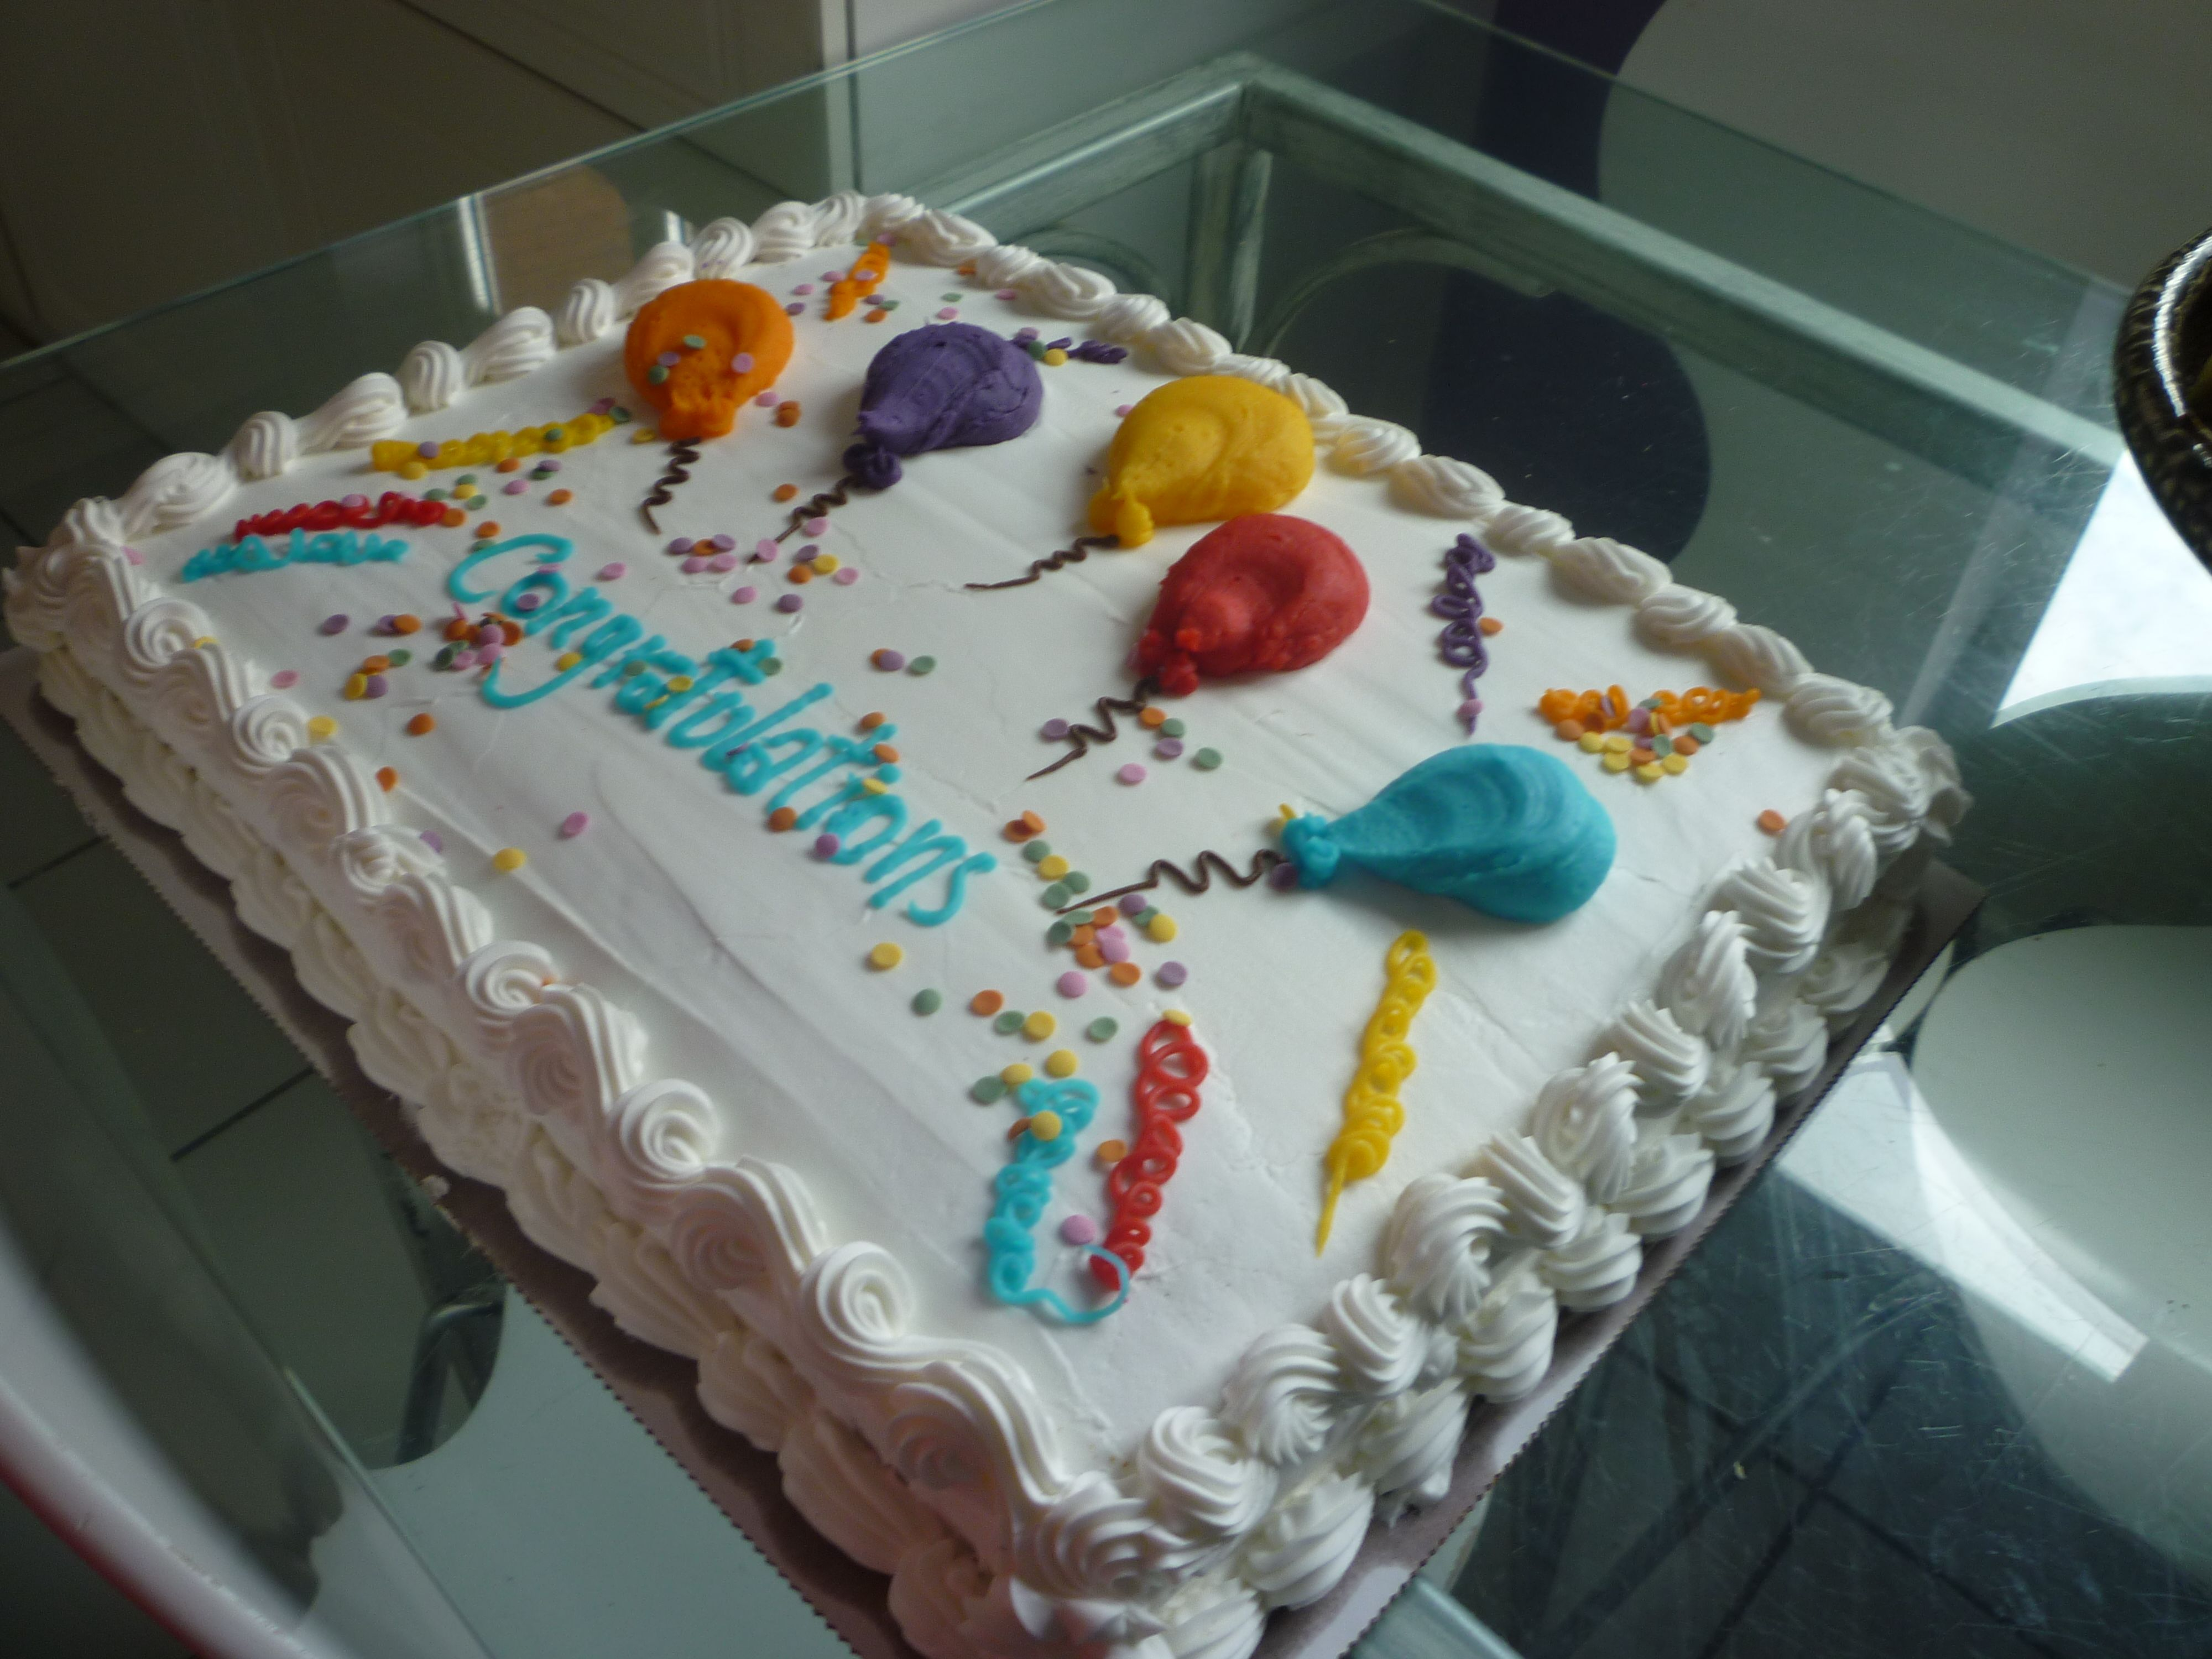 Remarkable 7 Costco Bakery Birthday Cakes Cupcakes Photo Costco Bakery Funny Birthday Cards Online Elaedamsfinfo